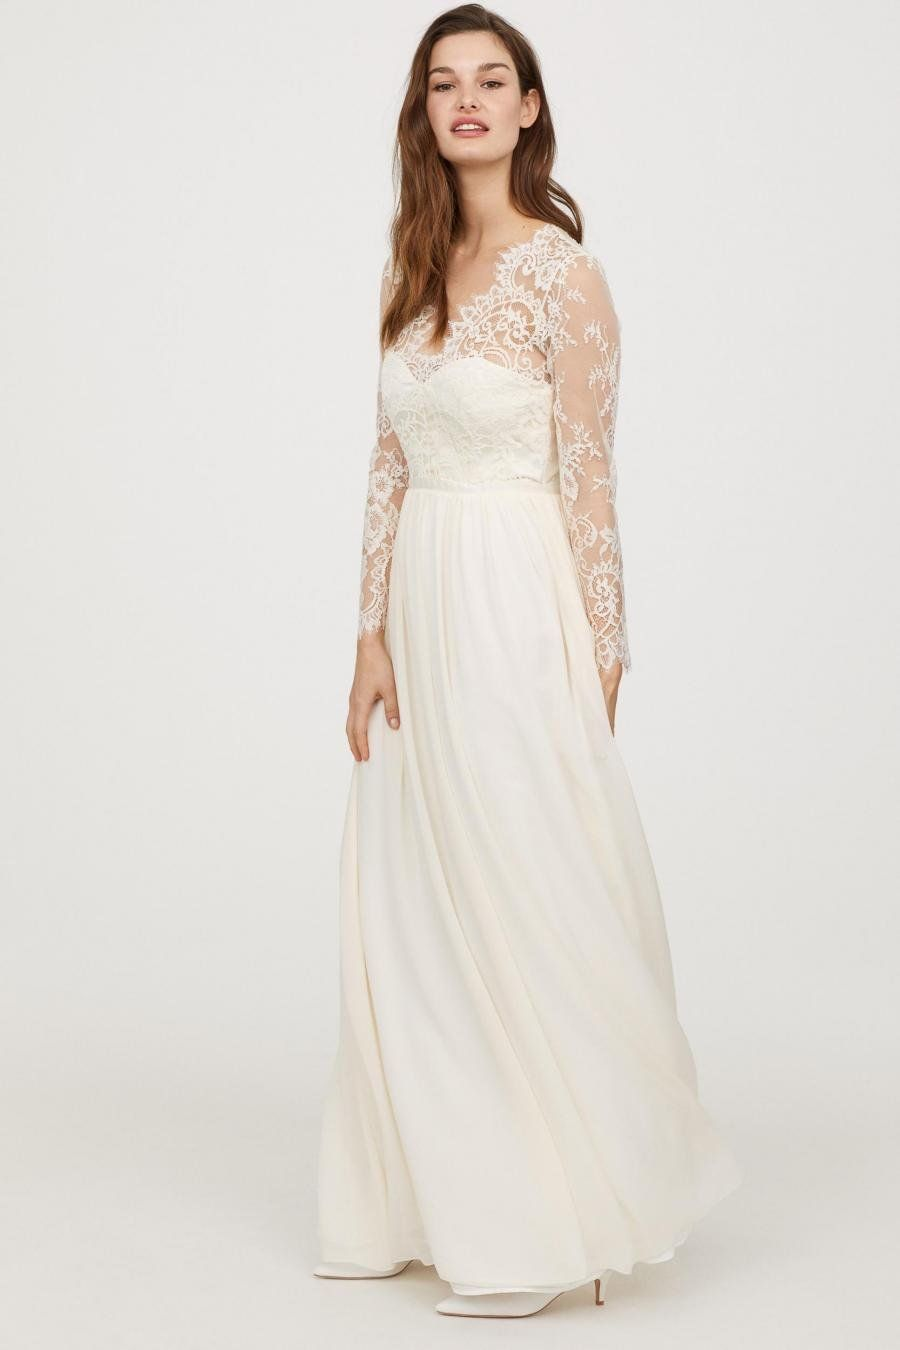 Cheap wedding dress! Similar to Kate Middleton one ... for 10 times ...